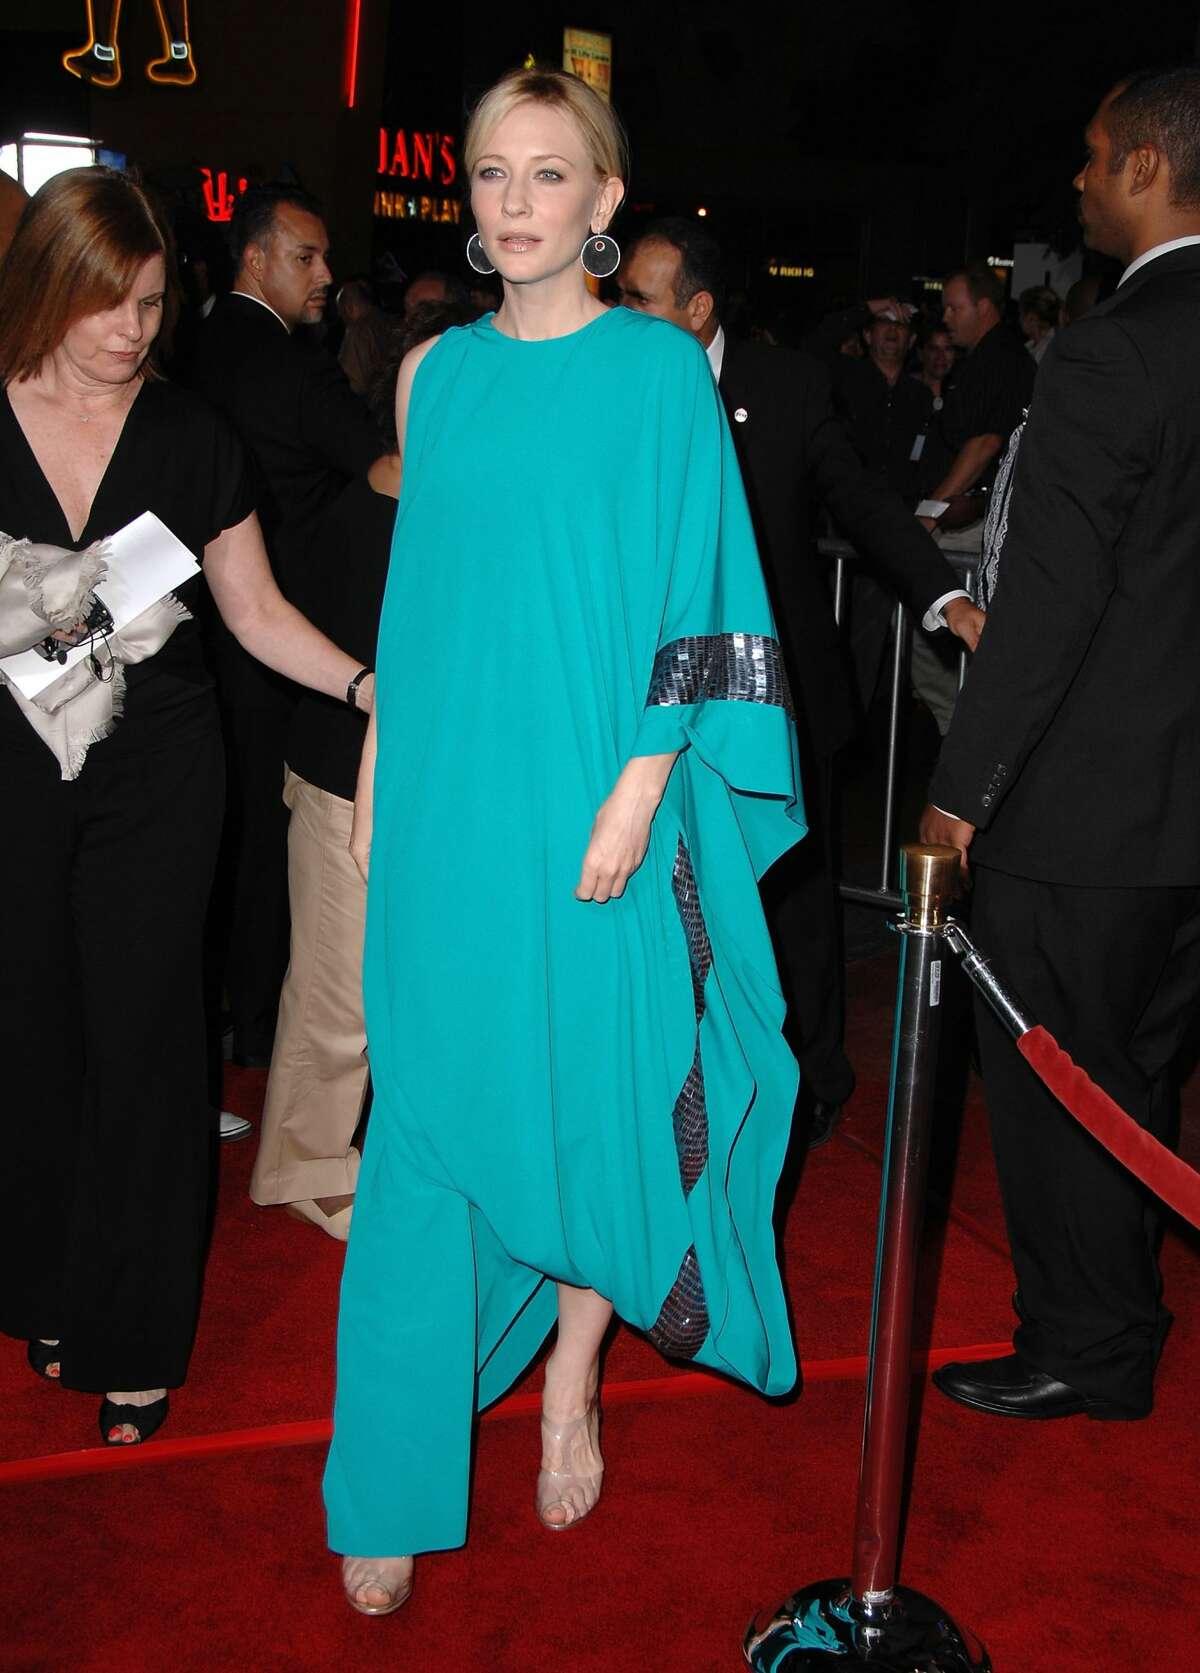 Cate Blanchett $12 million